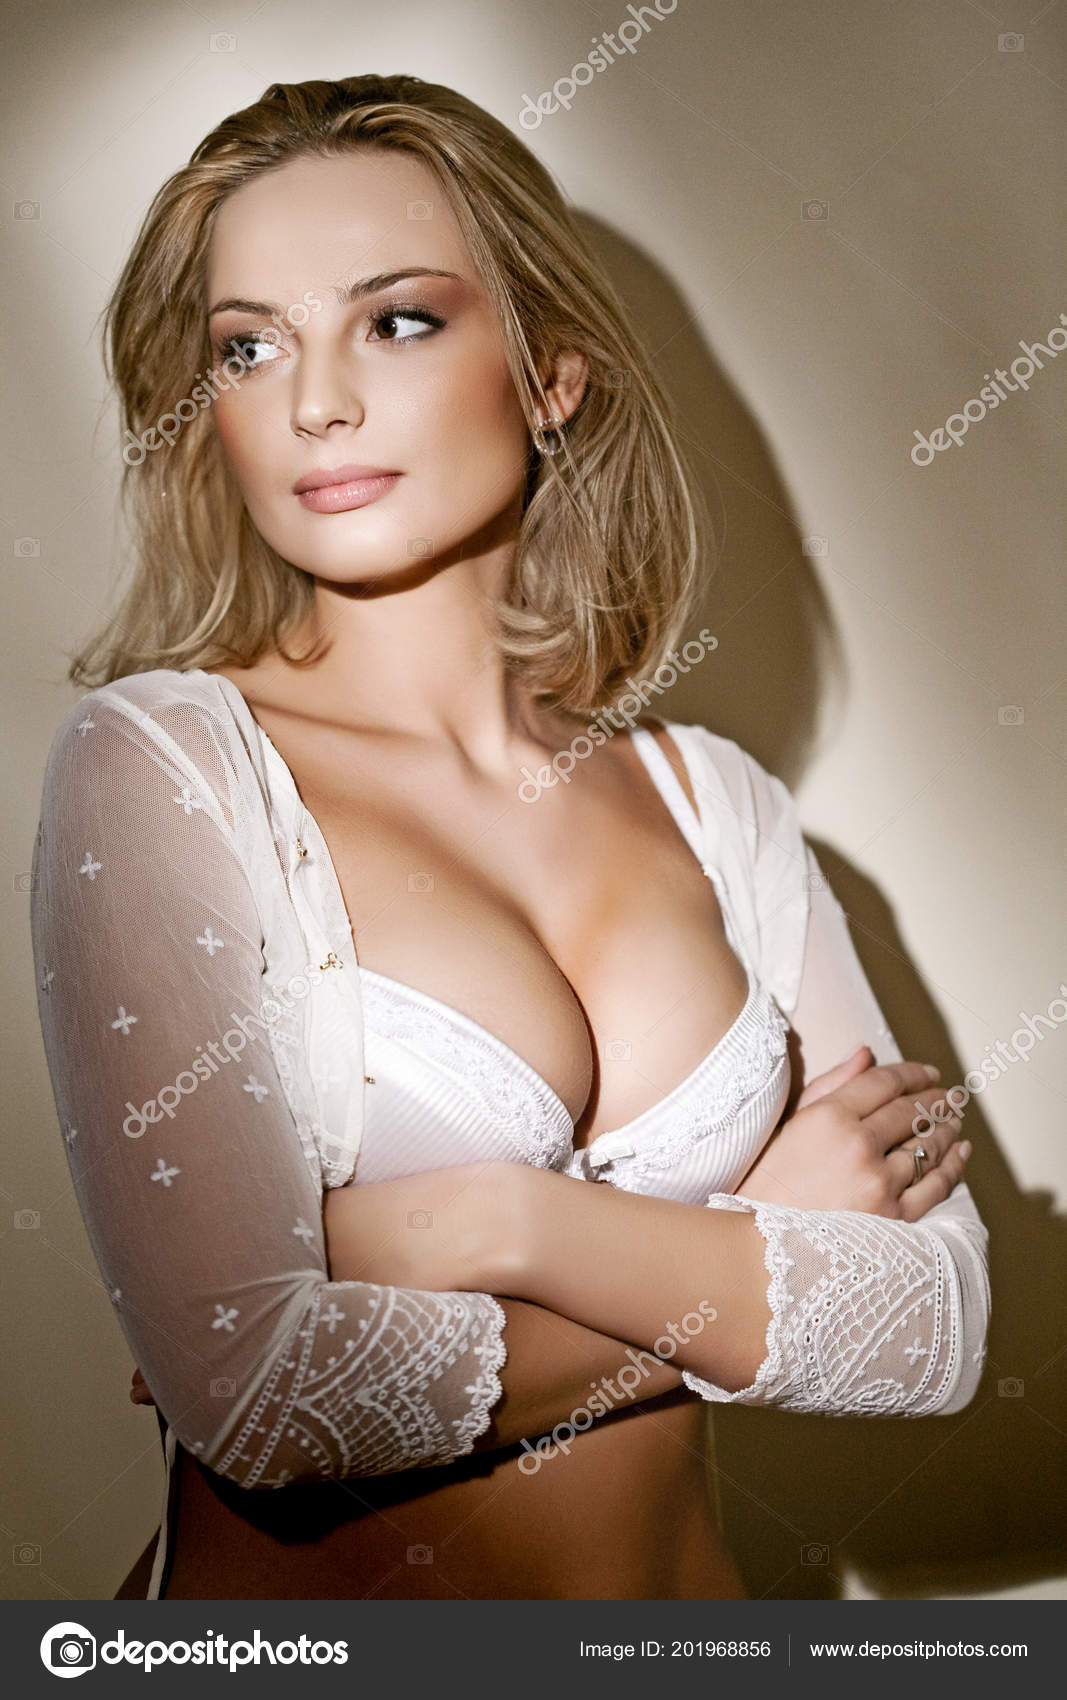 5a683aa87 Young Beautiful Blond Woman Portrait Studio Shot — Stock Photo ...